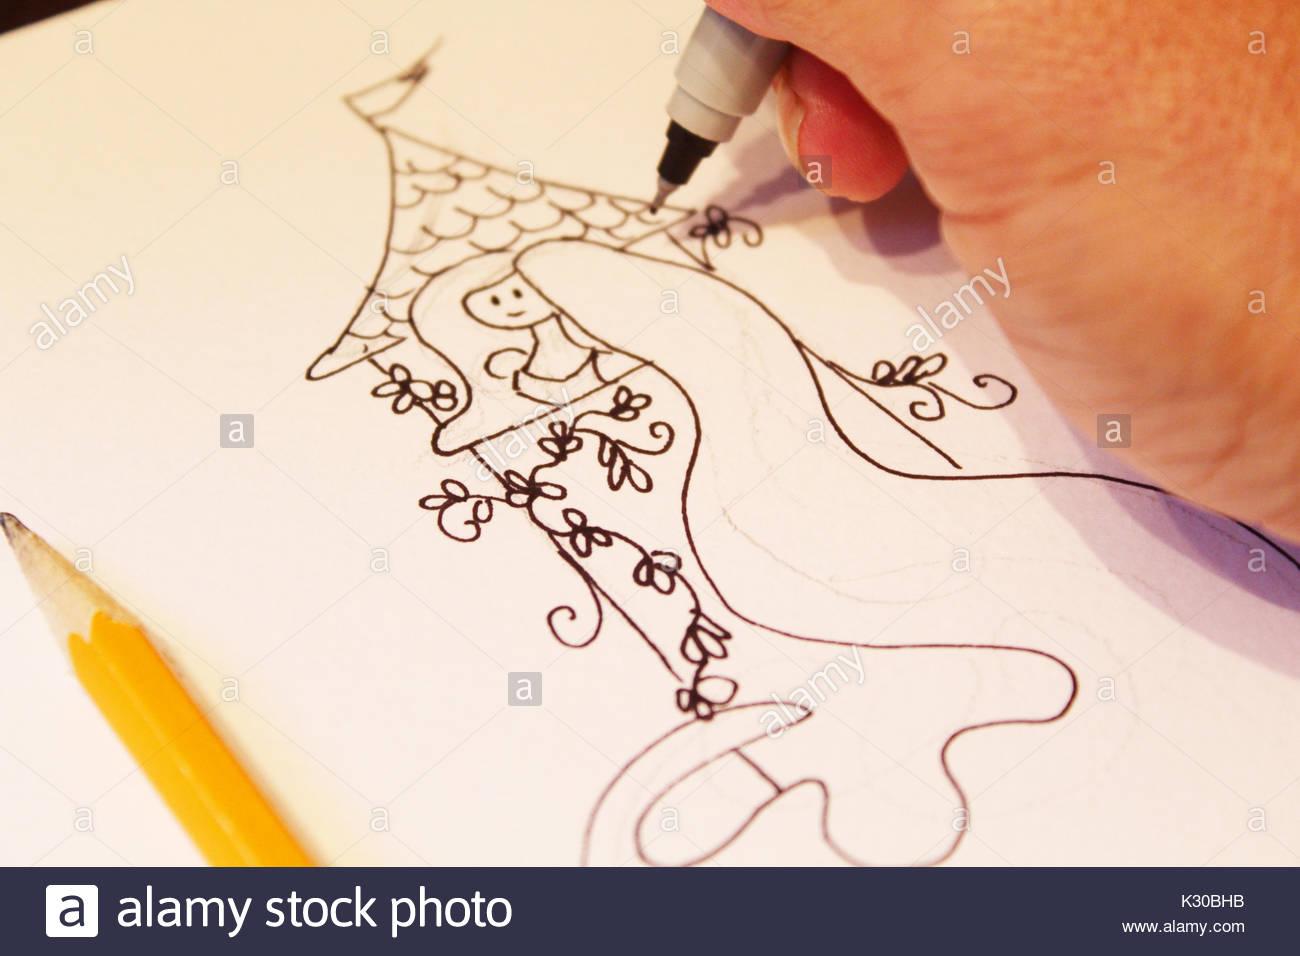 Rapunzel Drawing Sketch Stock Photo Alamy